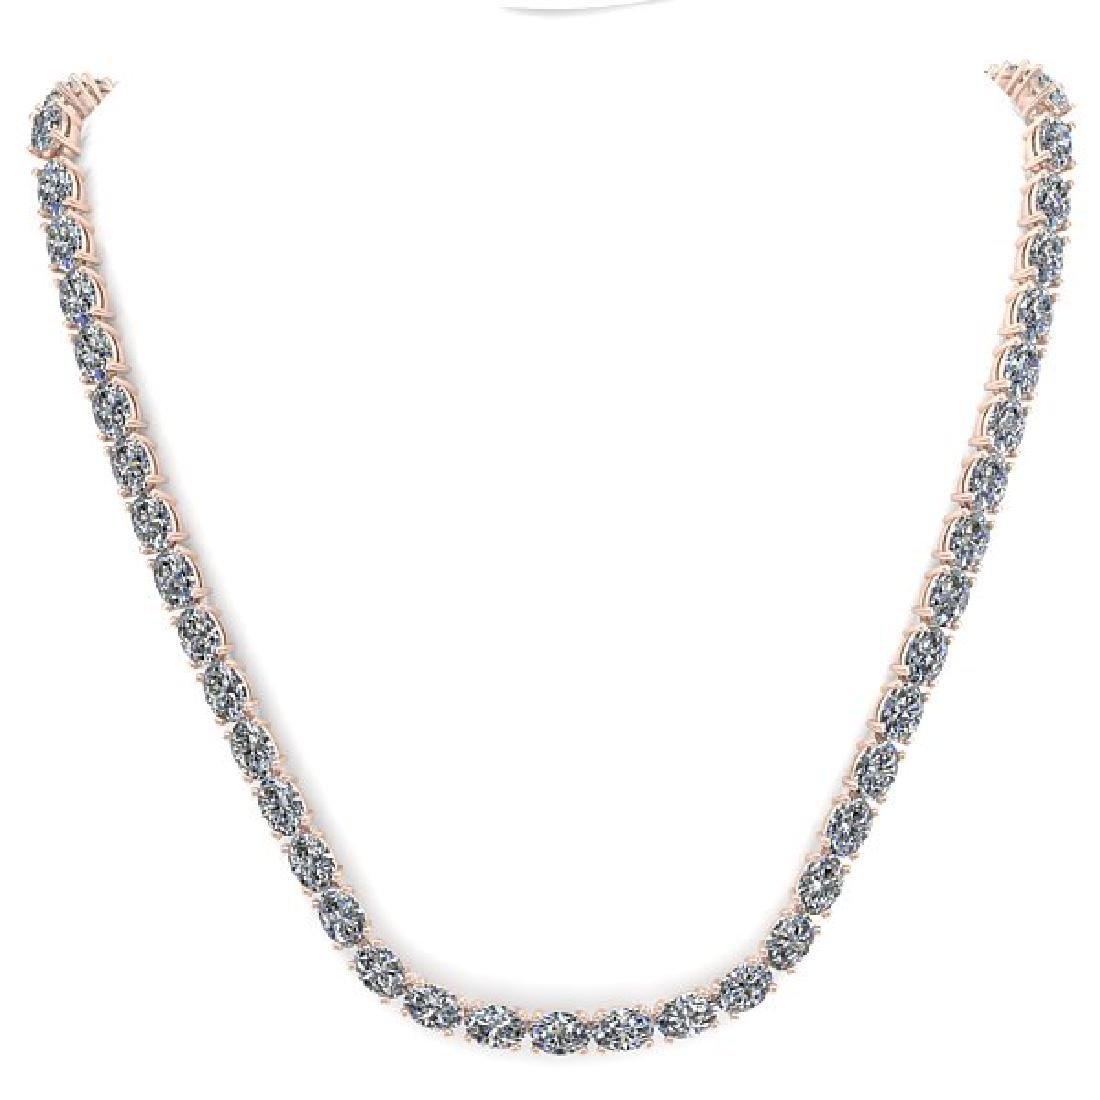 35 CTW Oval Cut Certified SI Diamond Necklace 18K Rose - 3